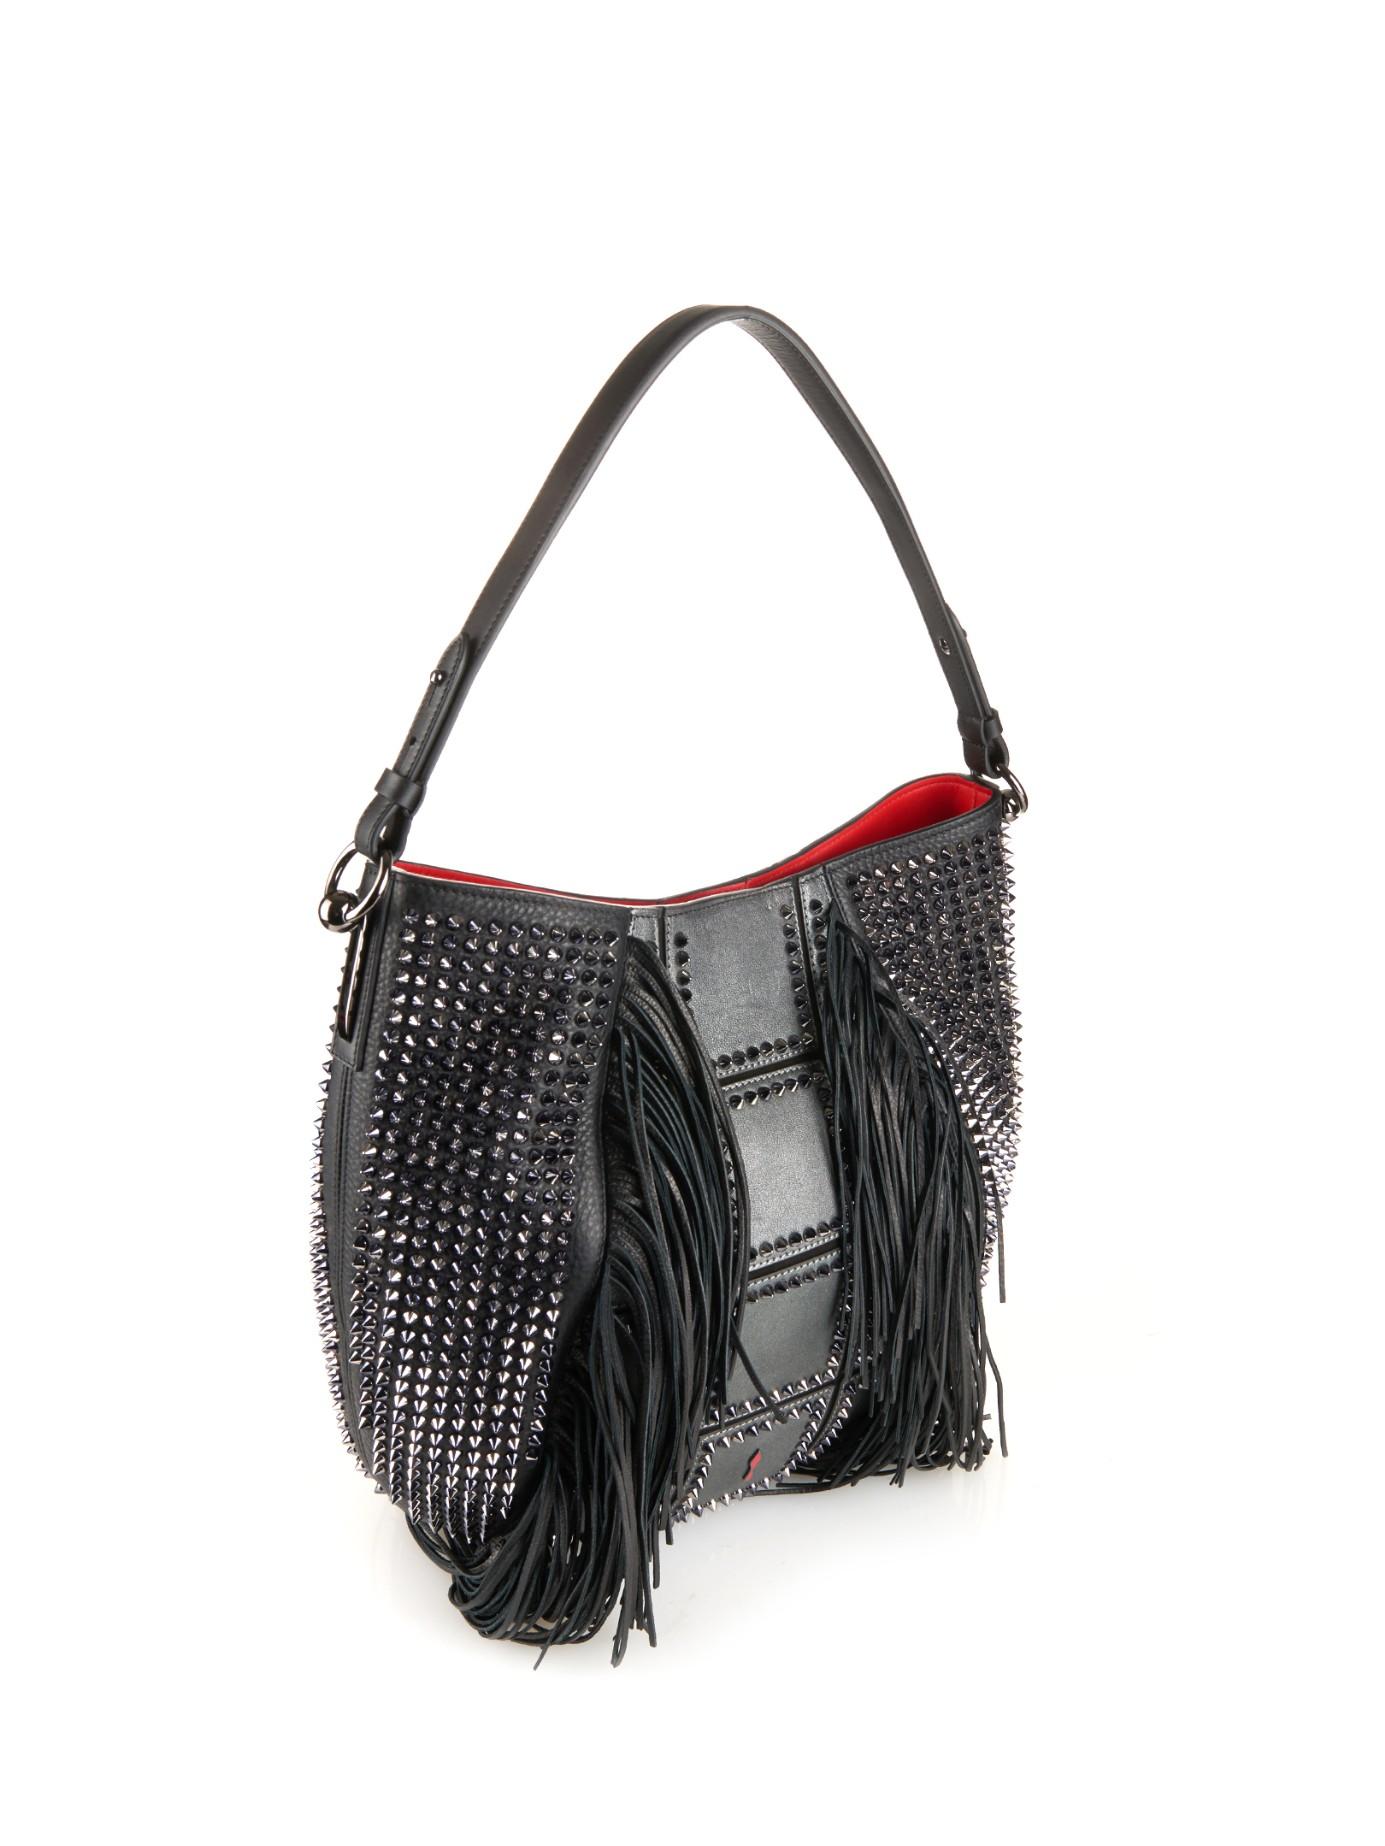 e664f620a02 Christian Louboutin Gray Lucky Hobo Fringe Shoulder Bag